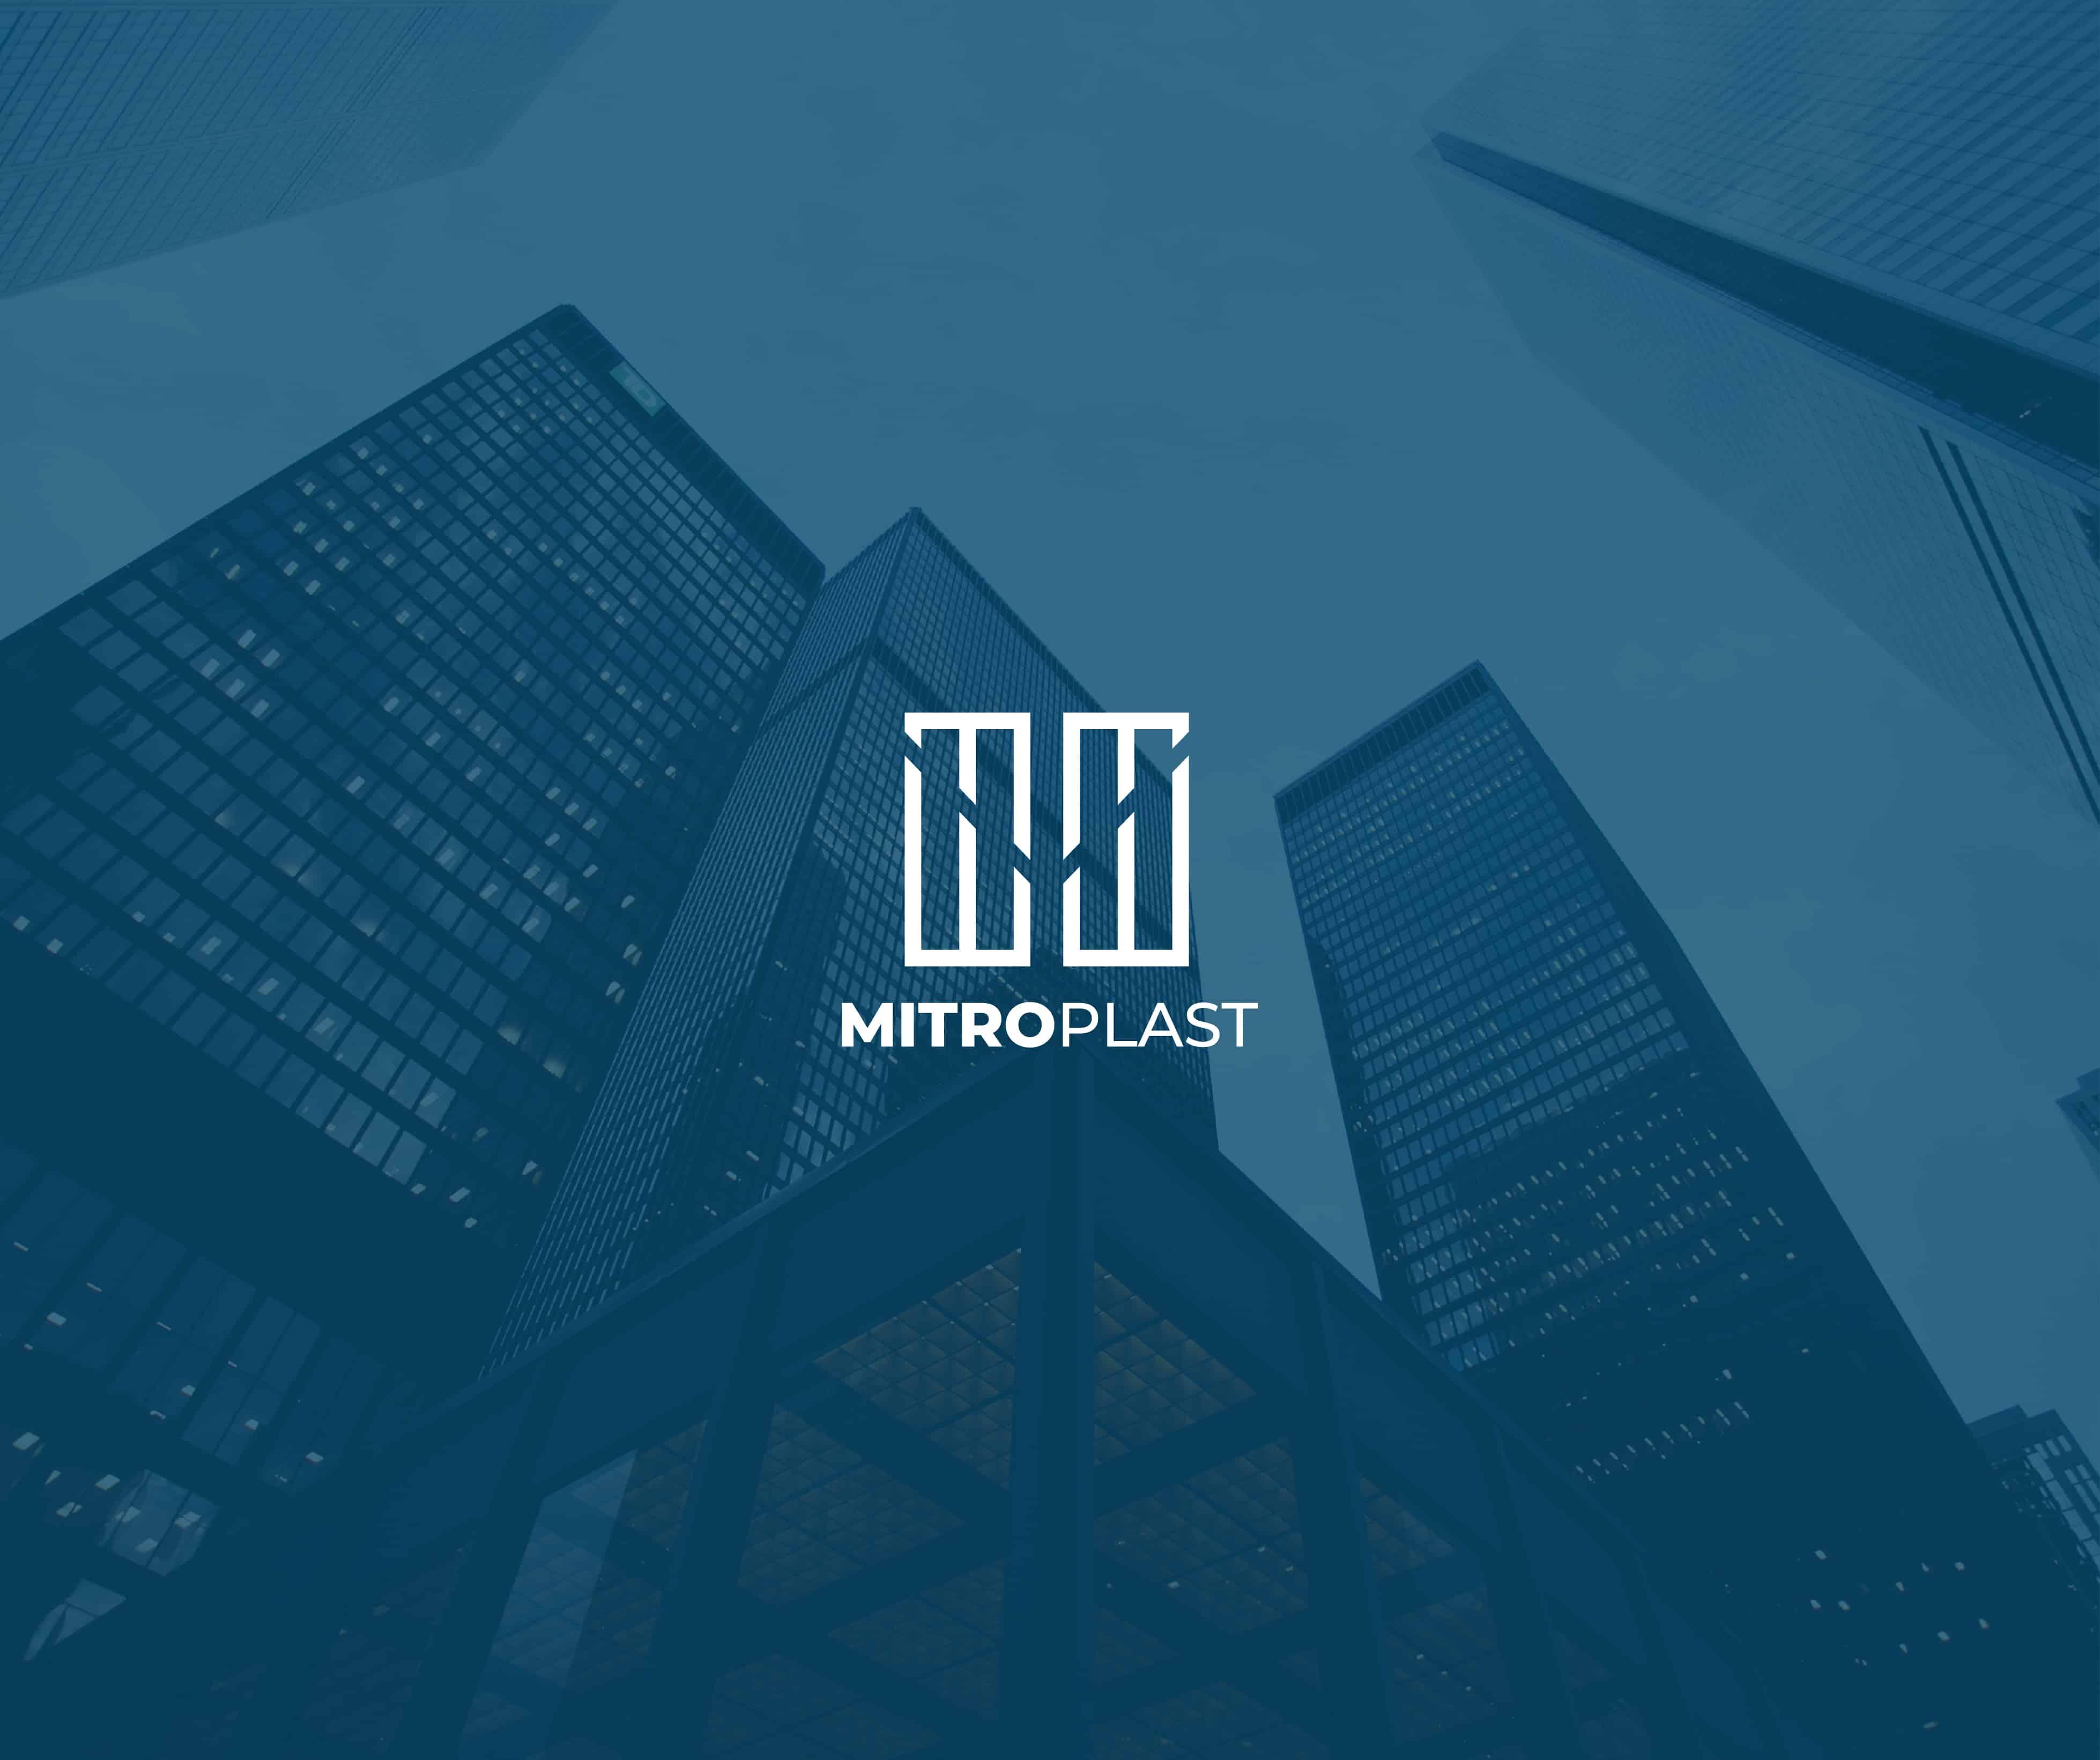 https://horizonplus.eu/project/mitroplast/